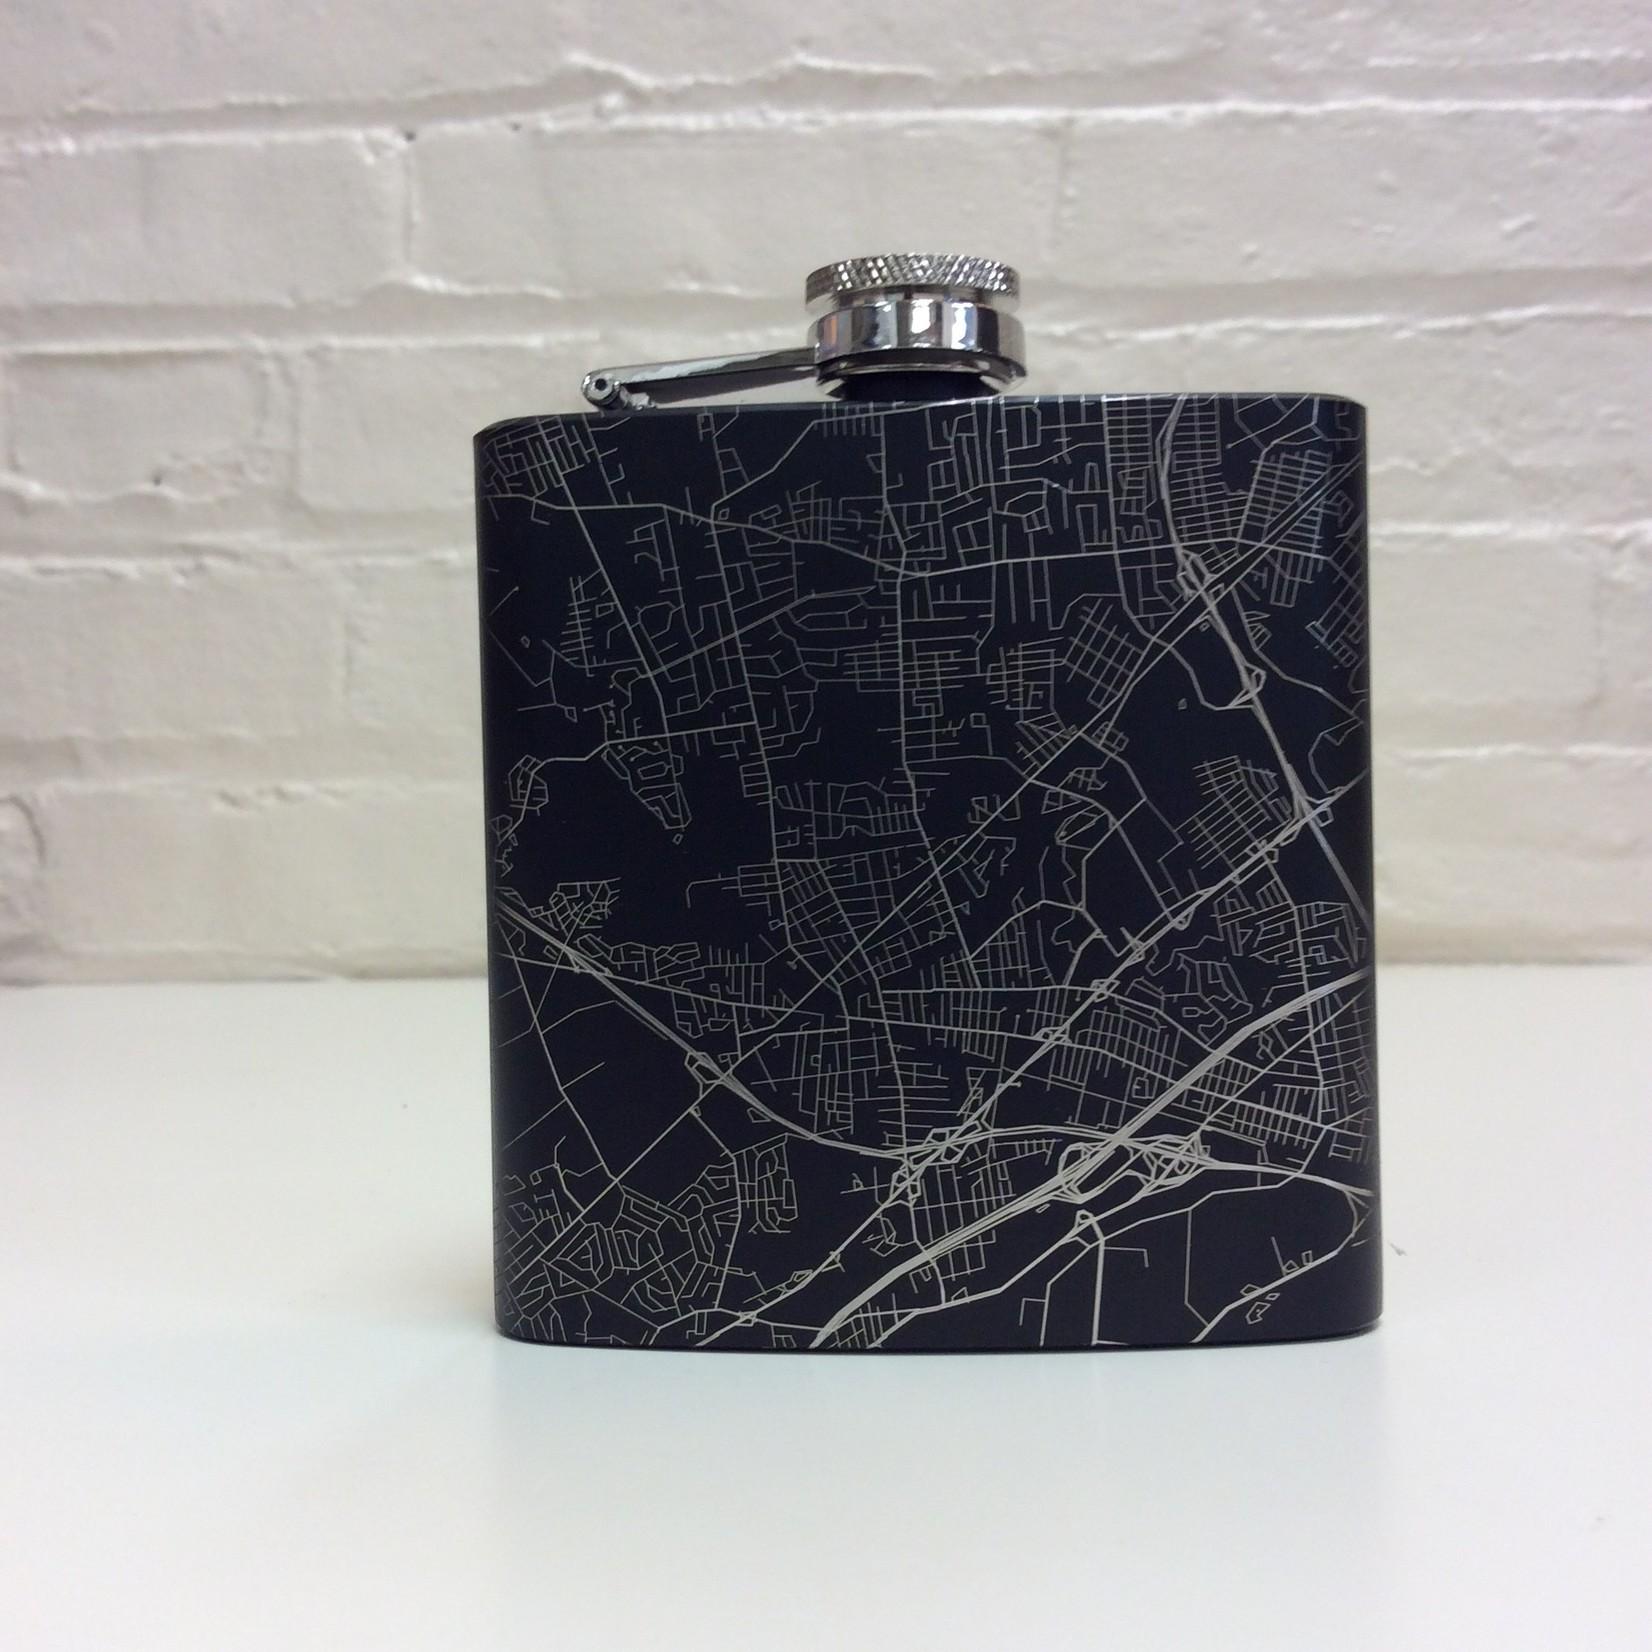 JACE design Metuchen N,J Map Hip Flask in Matte Black